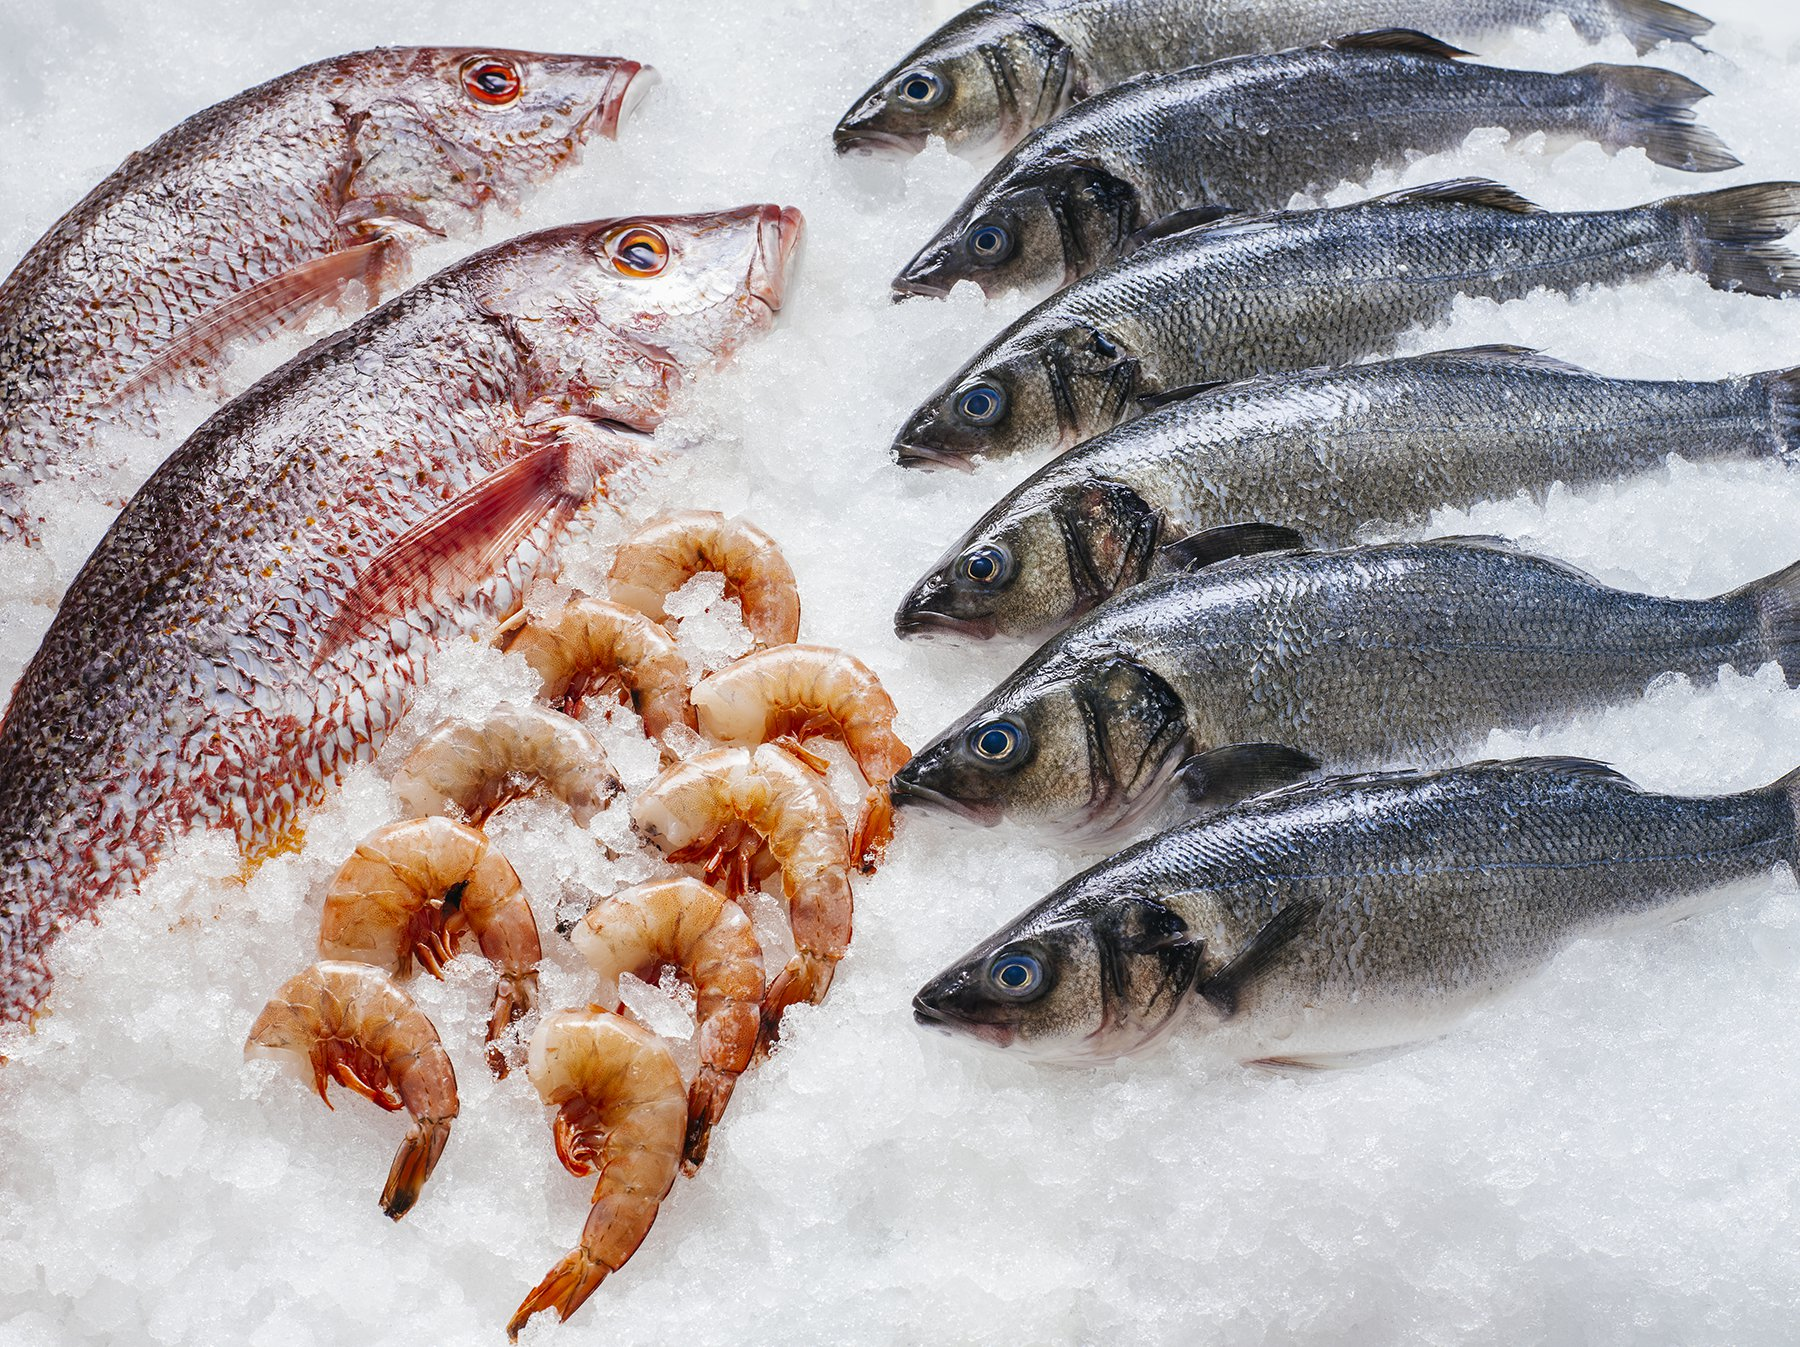 fish-00131.jpg